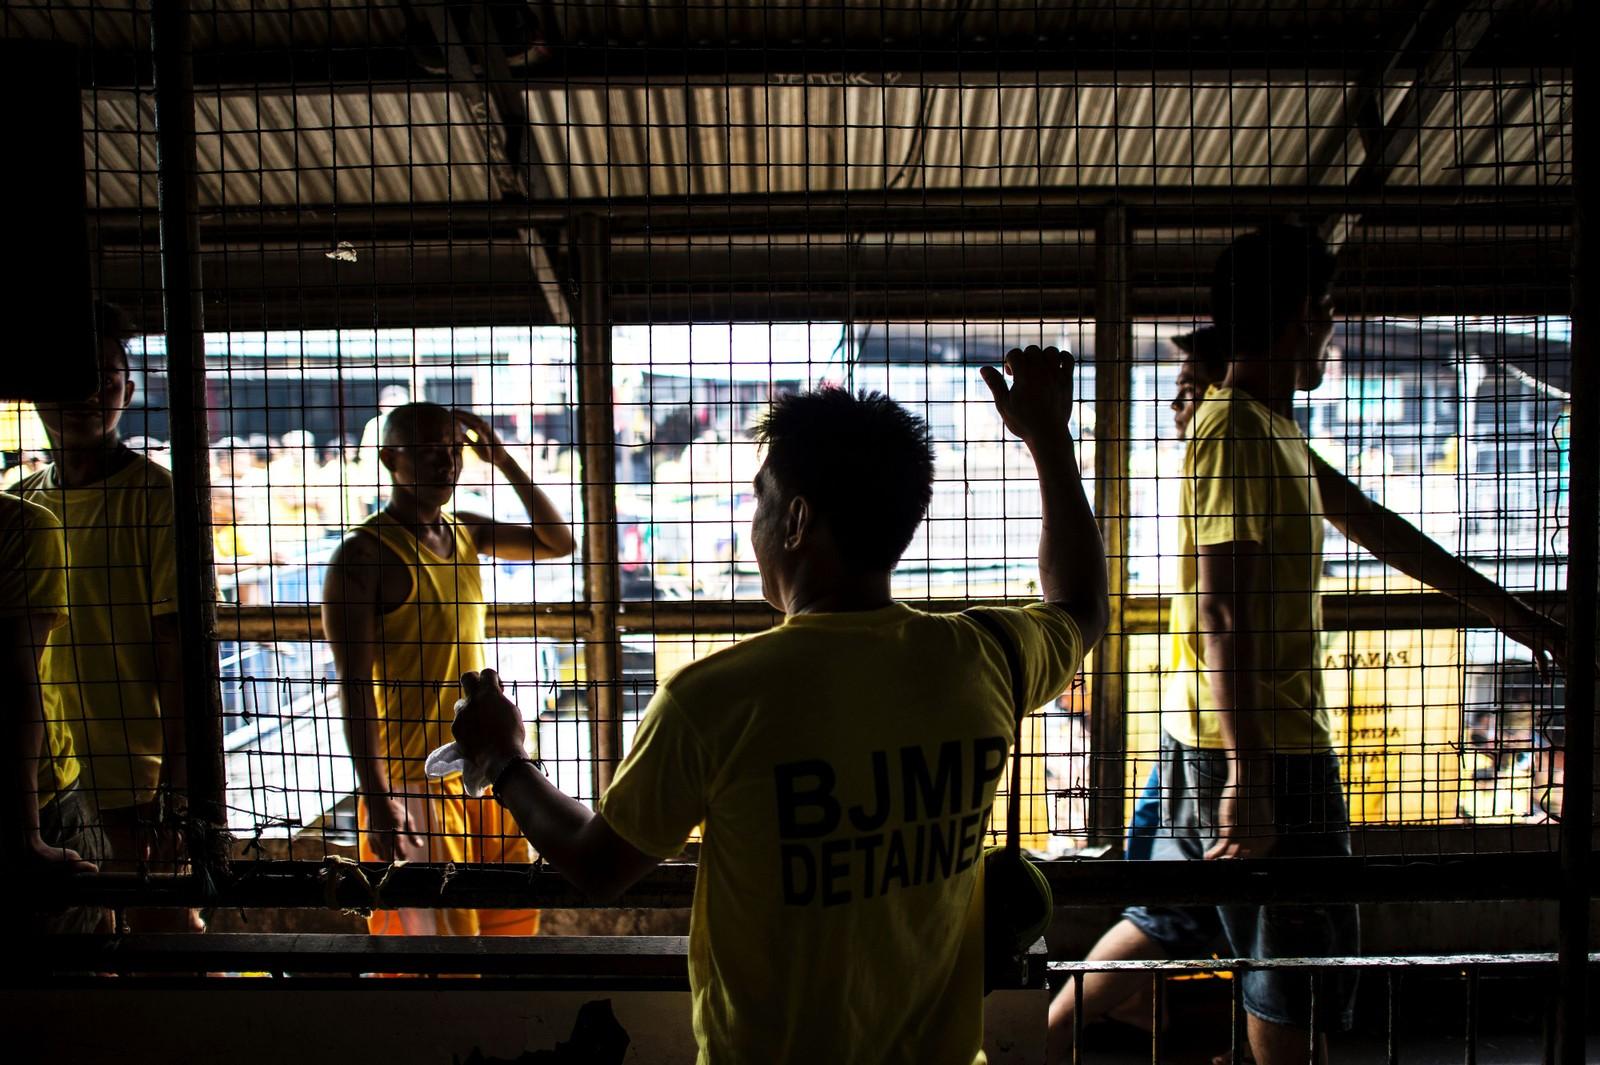 Mario Dimaculangan har sittet i Quezon City-fengselet i 15 år.